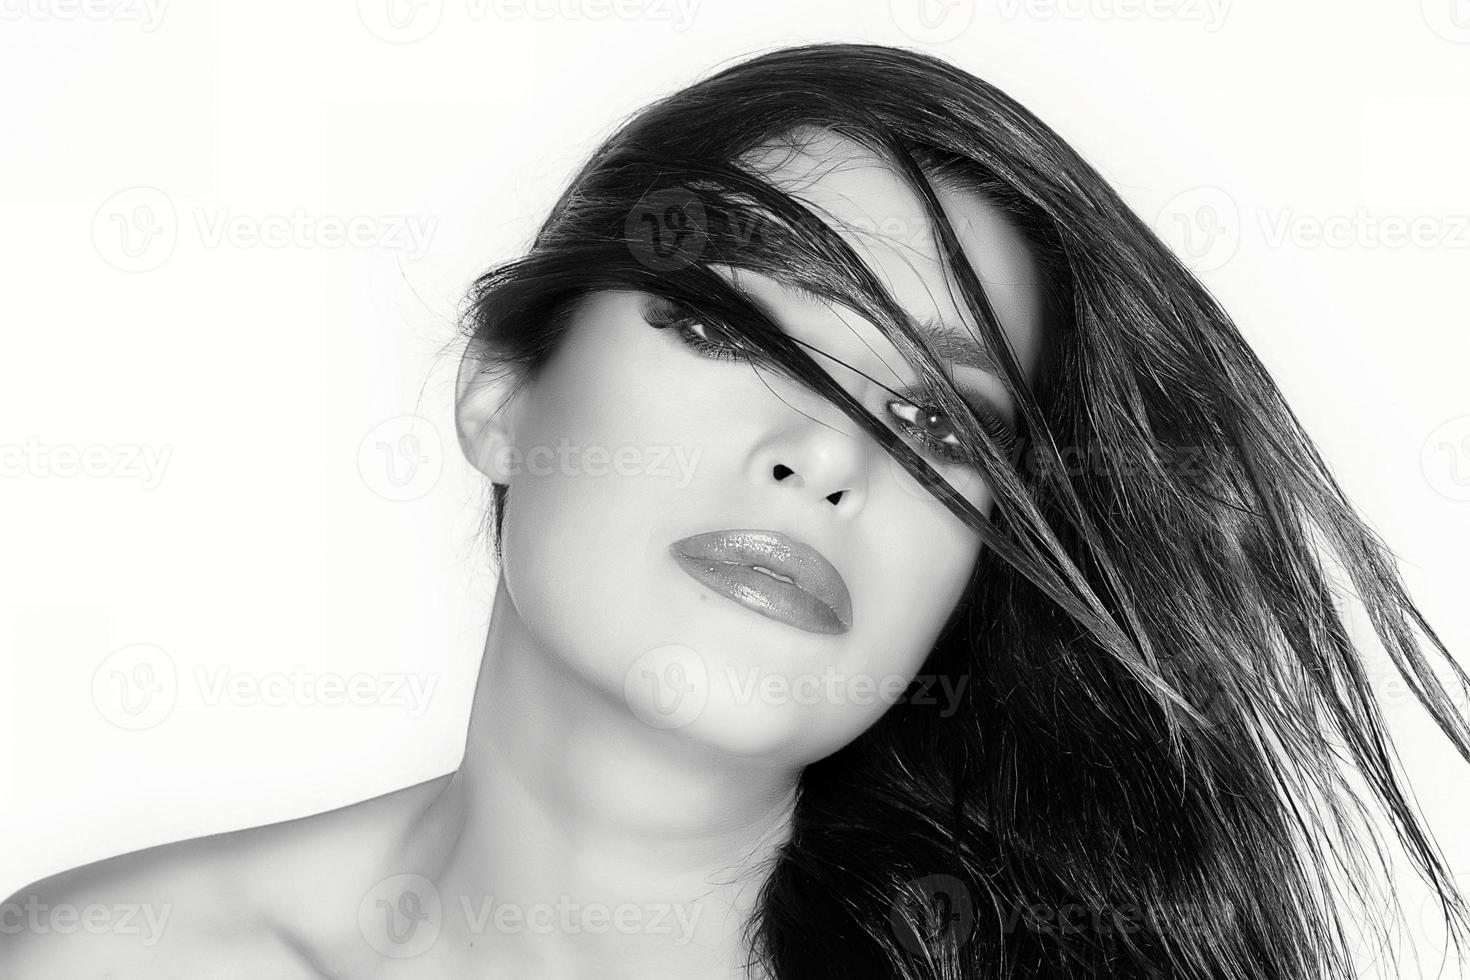 Hair Paraded. Beauty Fashion Portrait. Hairstyle. Monochrome Portrait photo